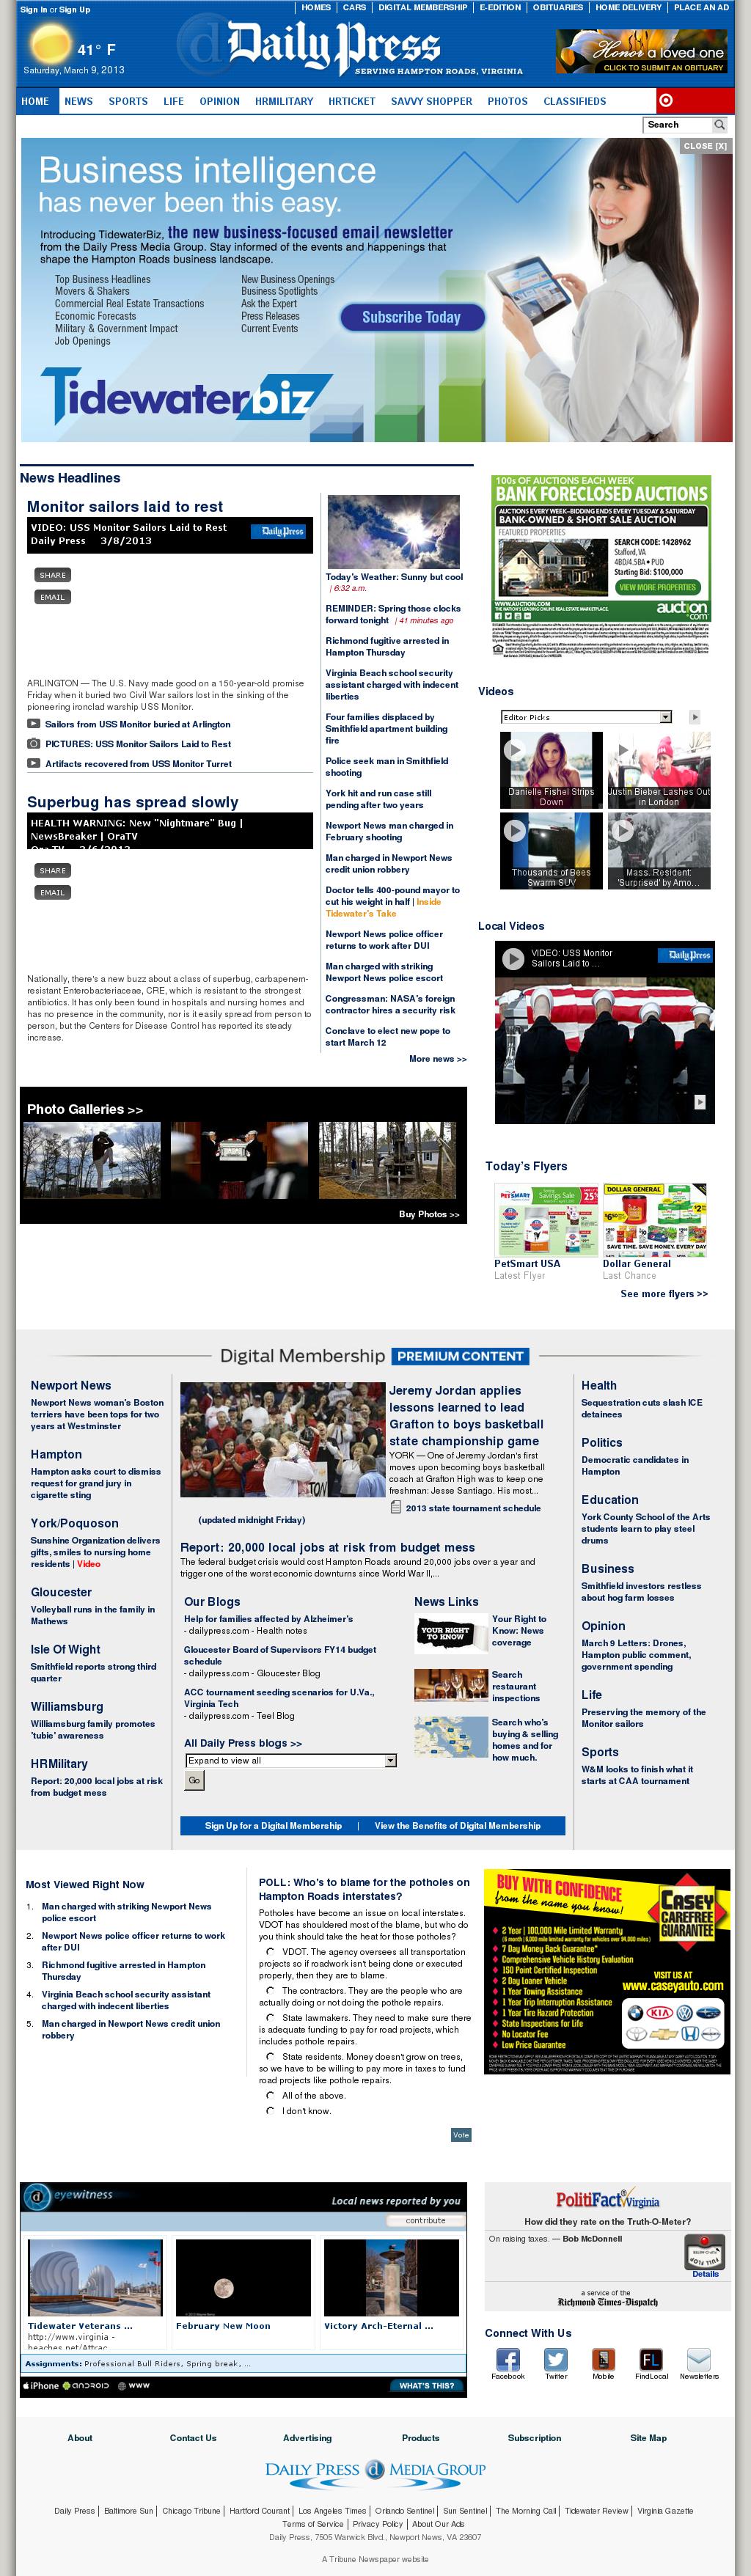 (Hampton Roads) Daily Press at Saturday March 9, 2013, 2:03 p.m. UTC